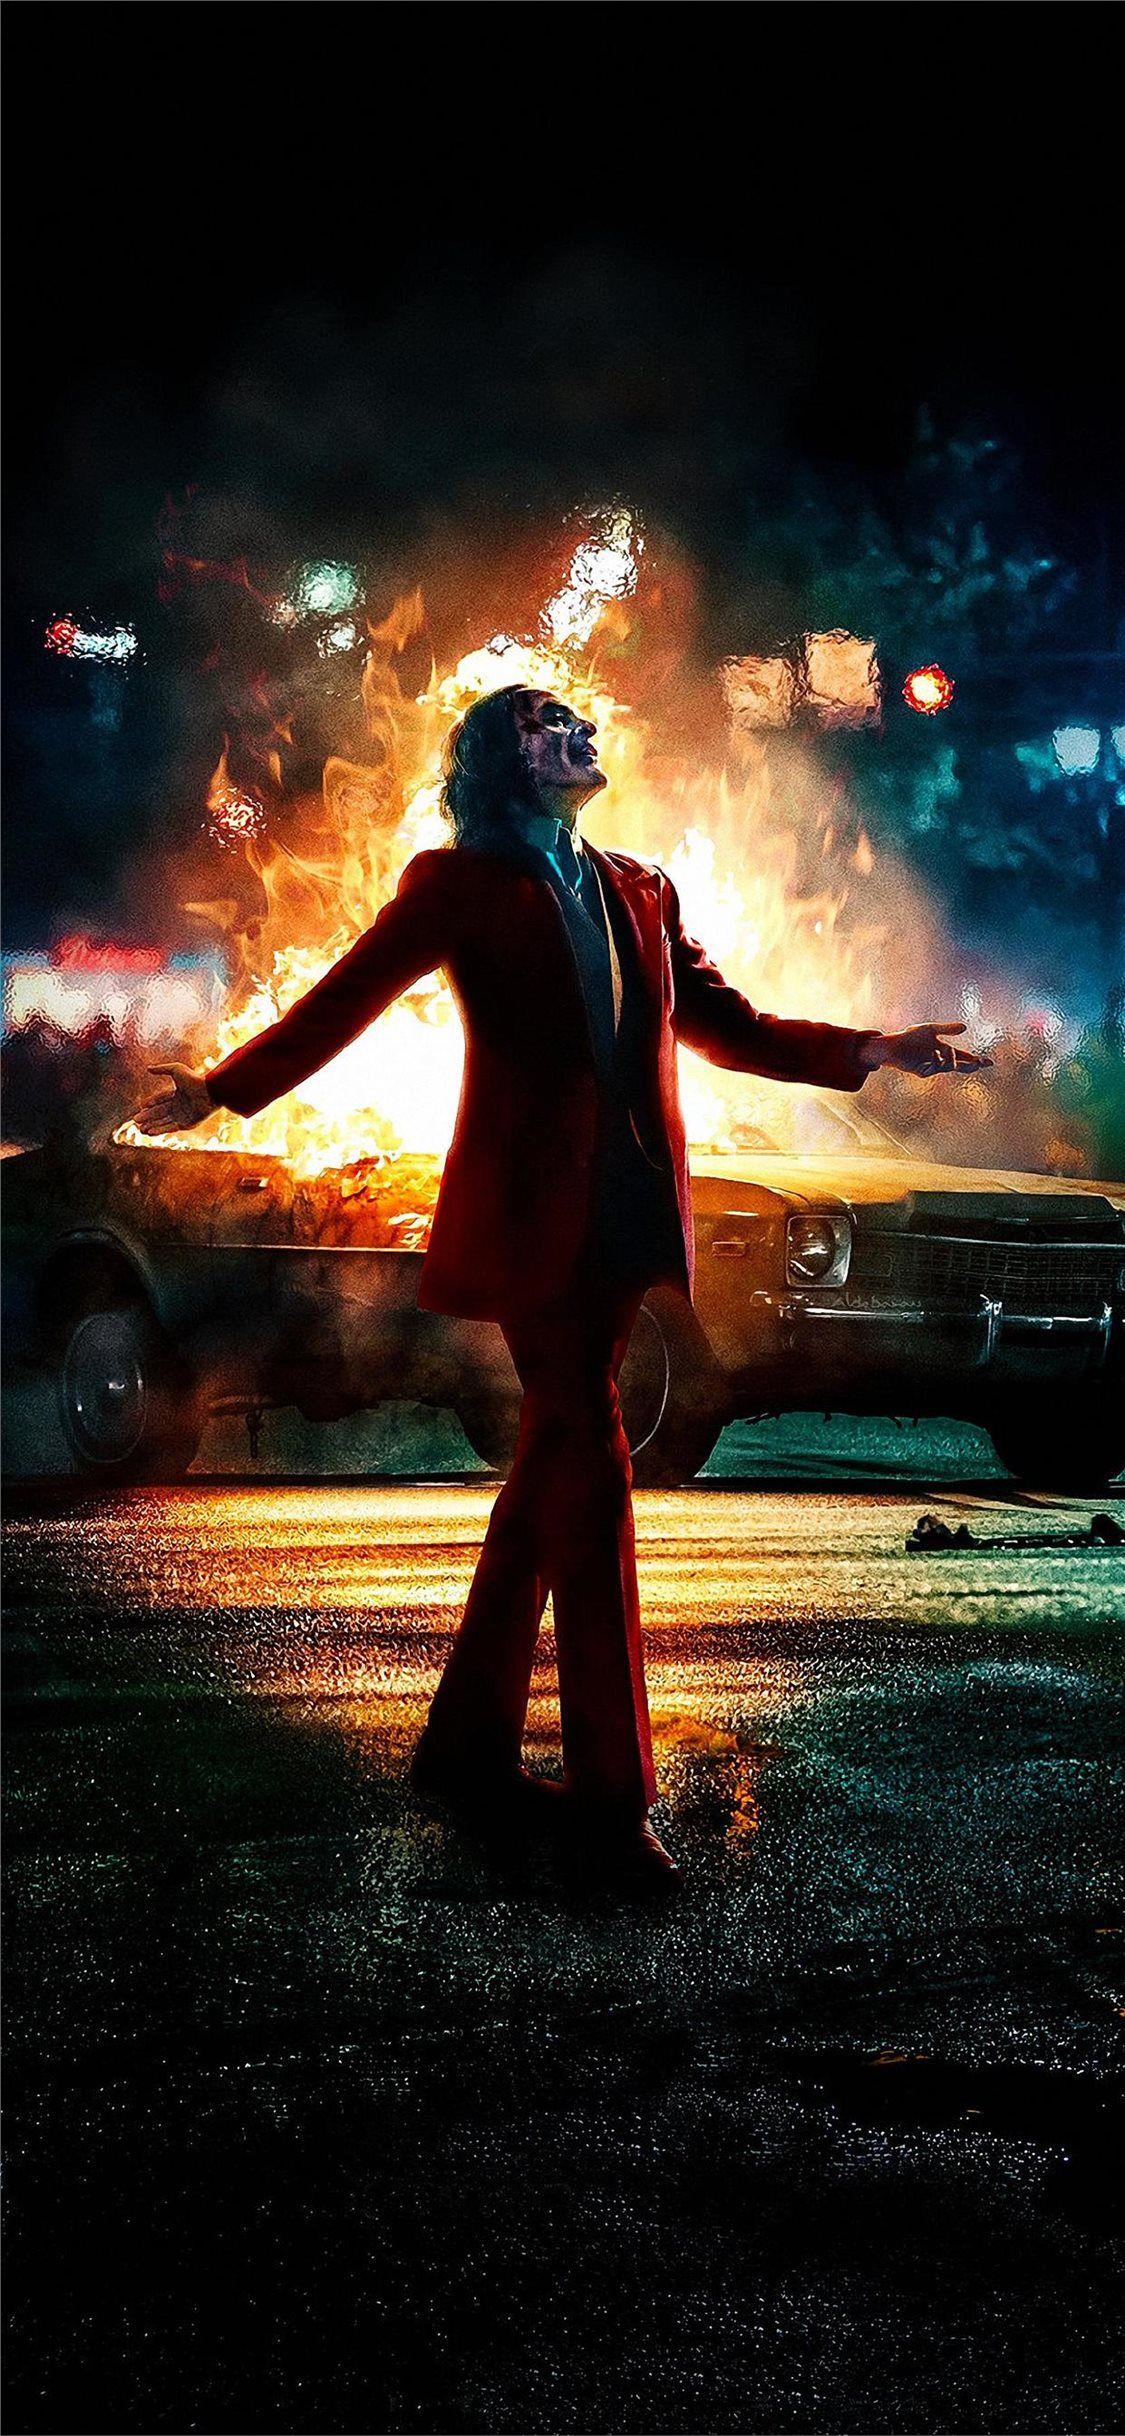 Free Download The Joker Imax Poster Wallpaper Beaty Your Iphone Joker Movie Joker 2019 Movies Movies Joa In 2020 Batman Joker Wallpaper Joker Poster Joker Film